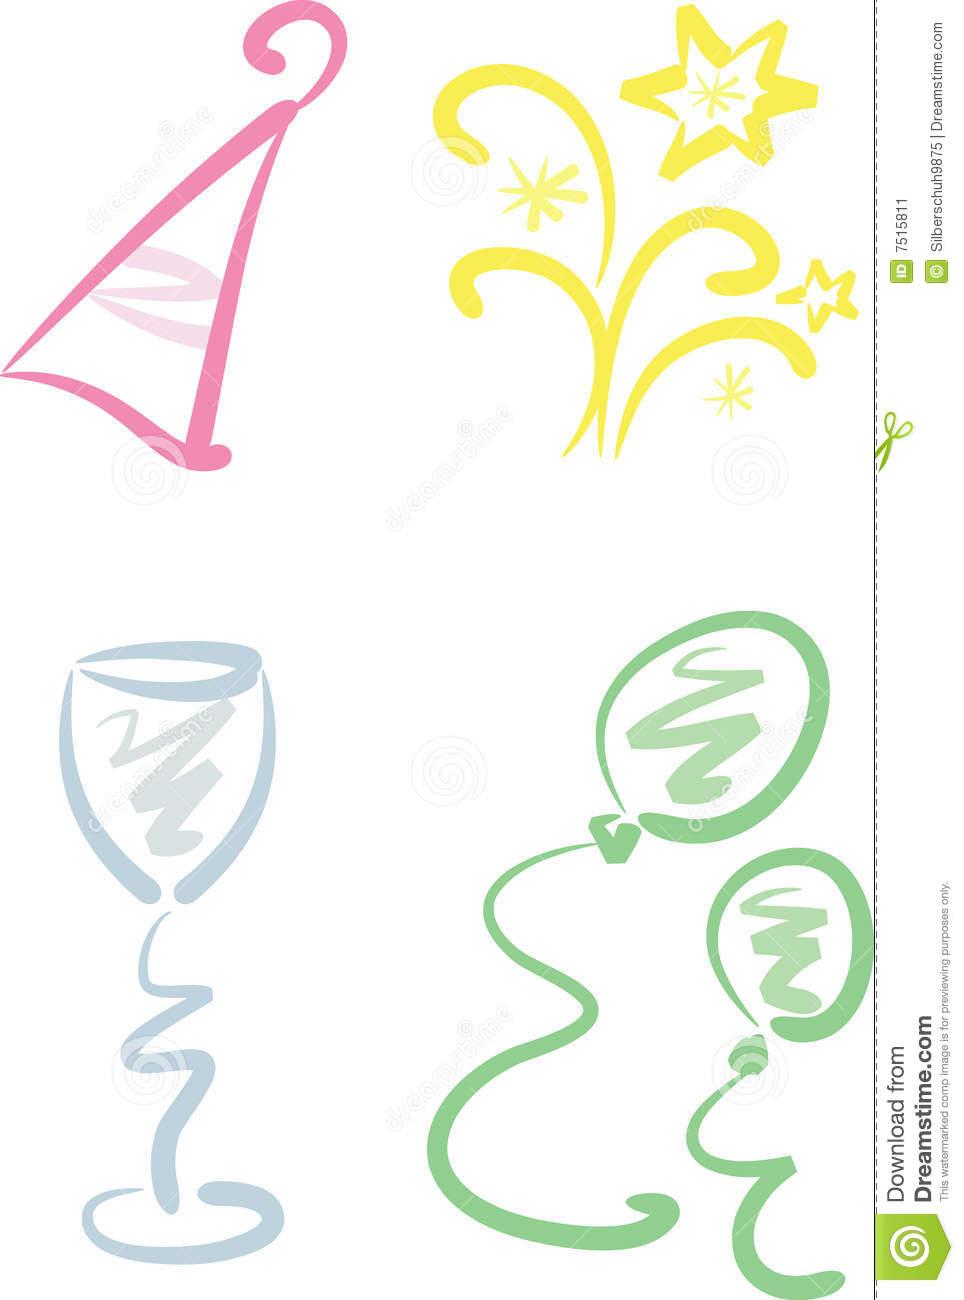 medium resolution of beginning clipart clip art set new year party